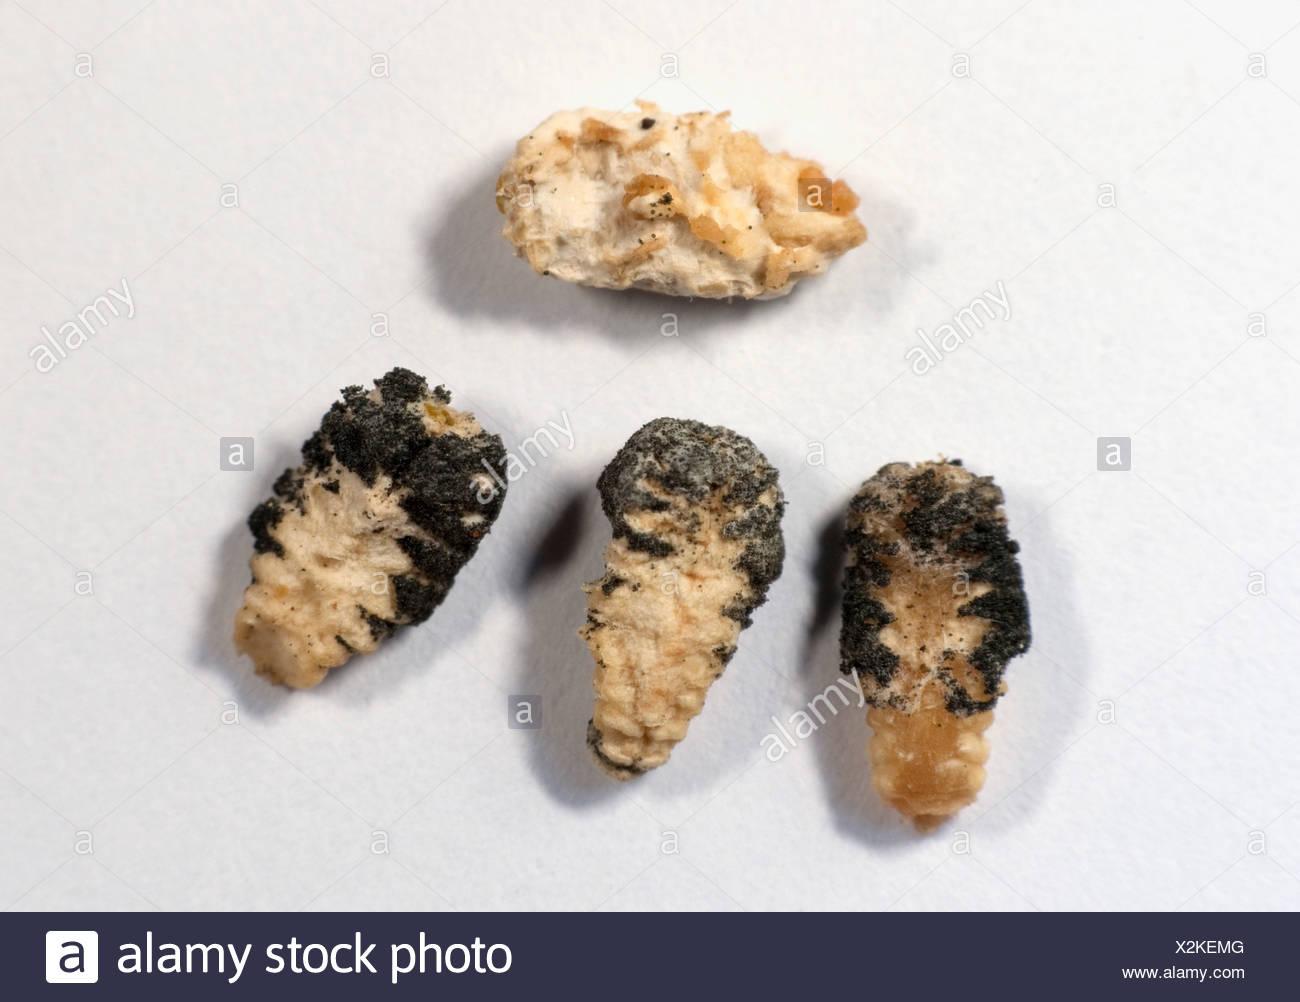 Dead Larvae showing Sacbrood disease Honey Bee Apis mellifera Kent UK - Stock Image